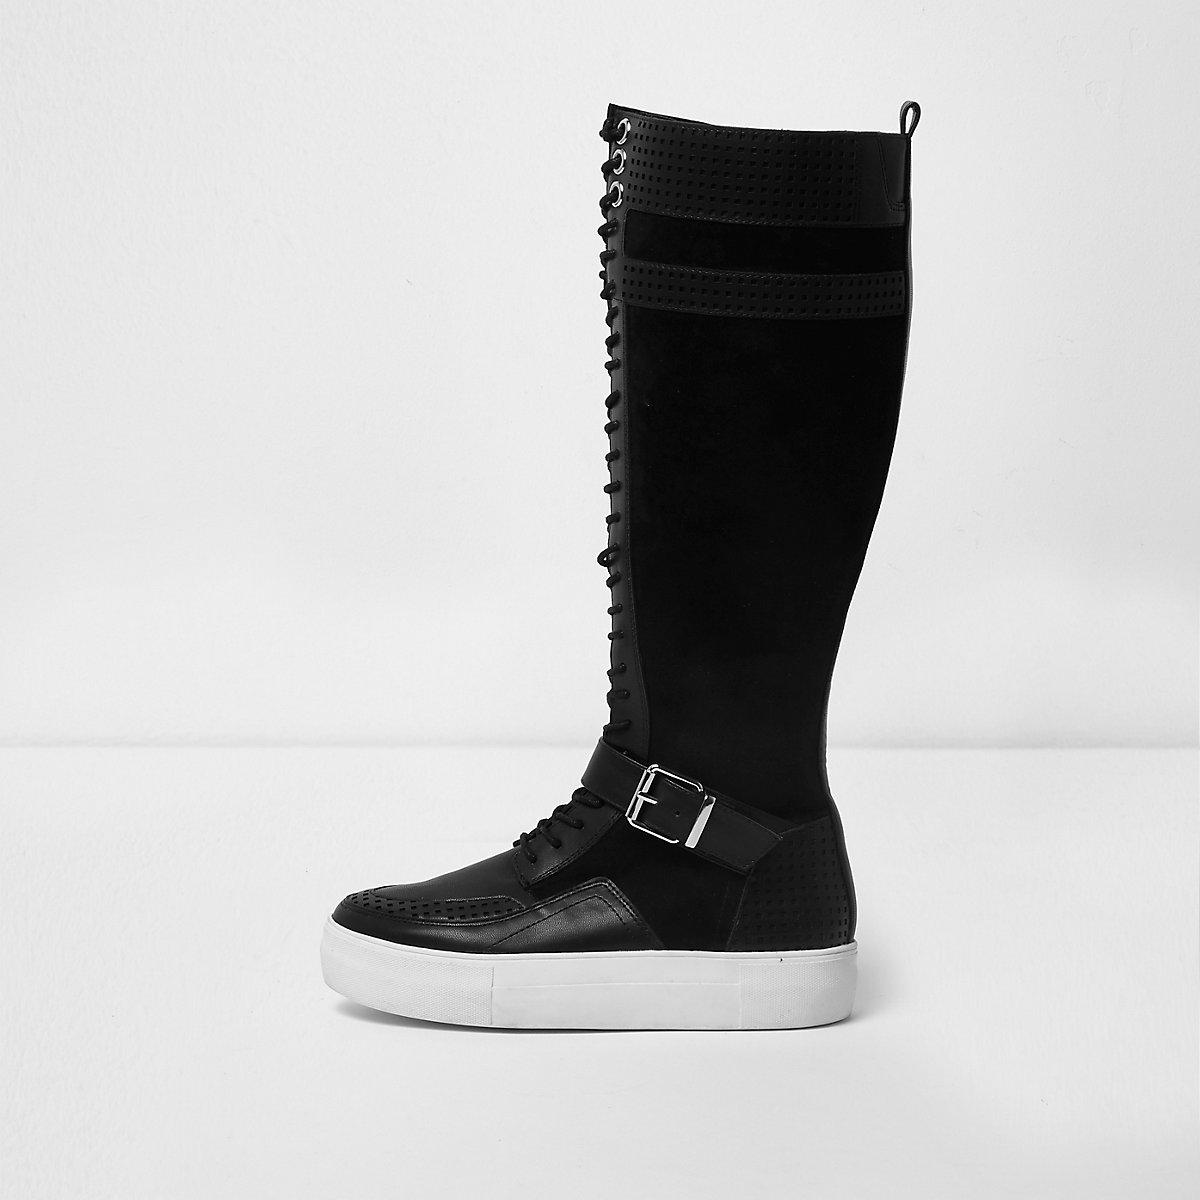 Black lace-up flatform knee high trainers